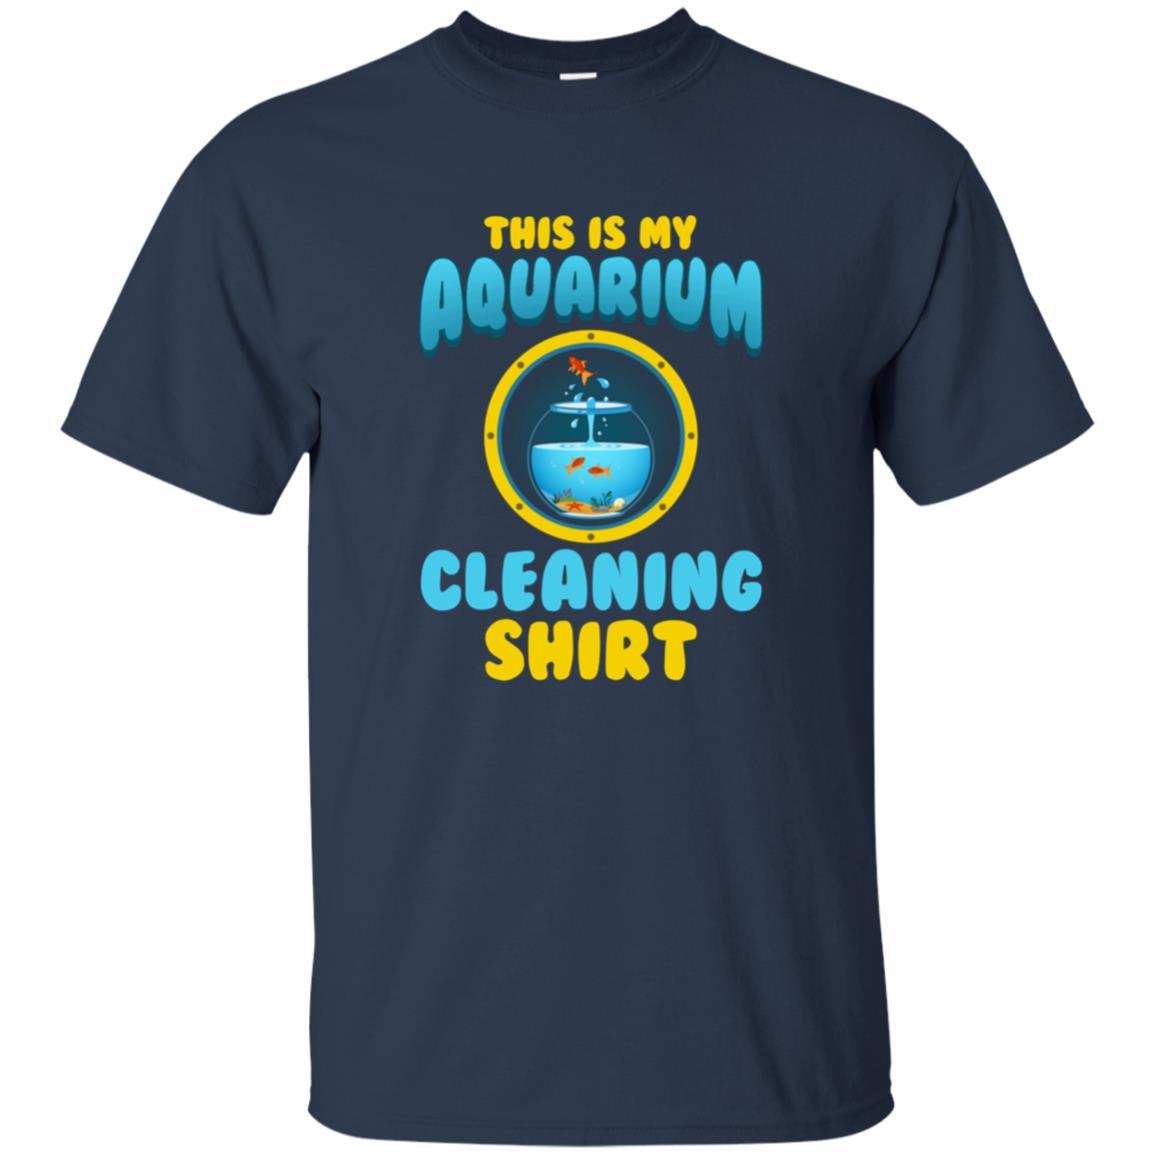 Fish Tank Cleaning – Funny Aquarium Unisex Short Sleeve